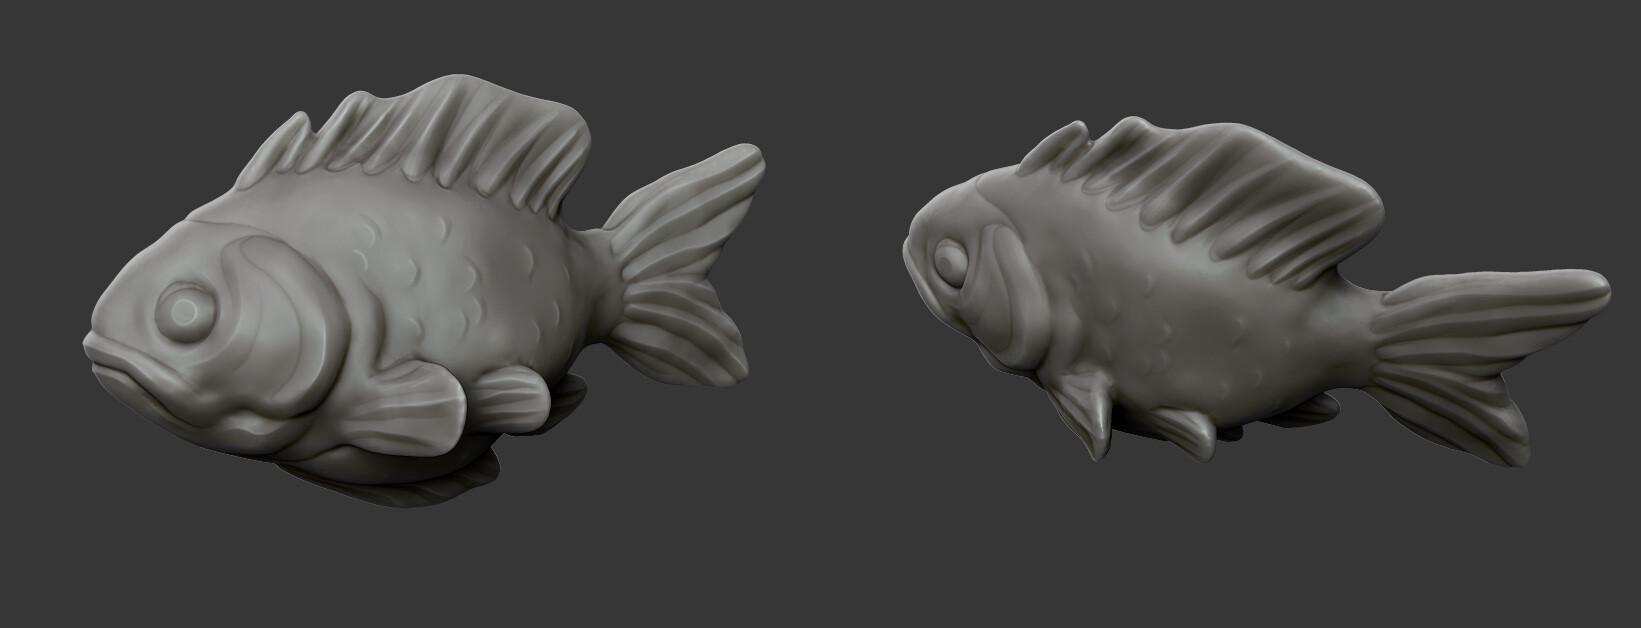 ArtStation - Stylized Fish, 3dExtrude Tutorials